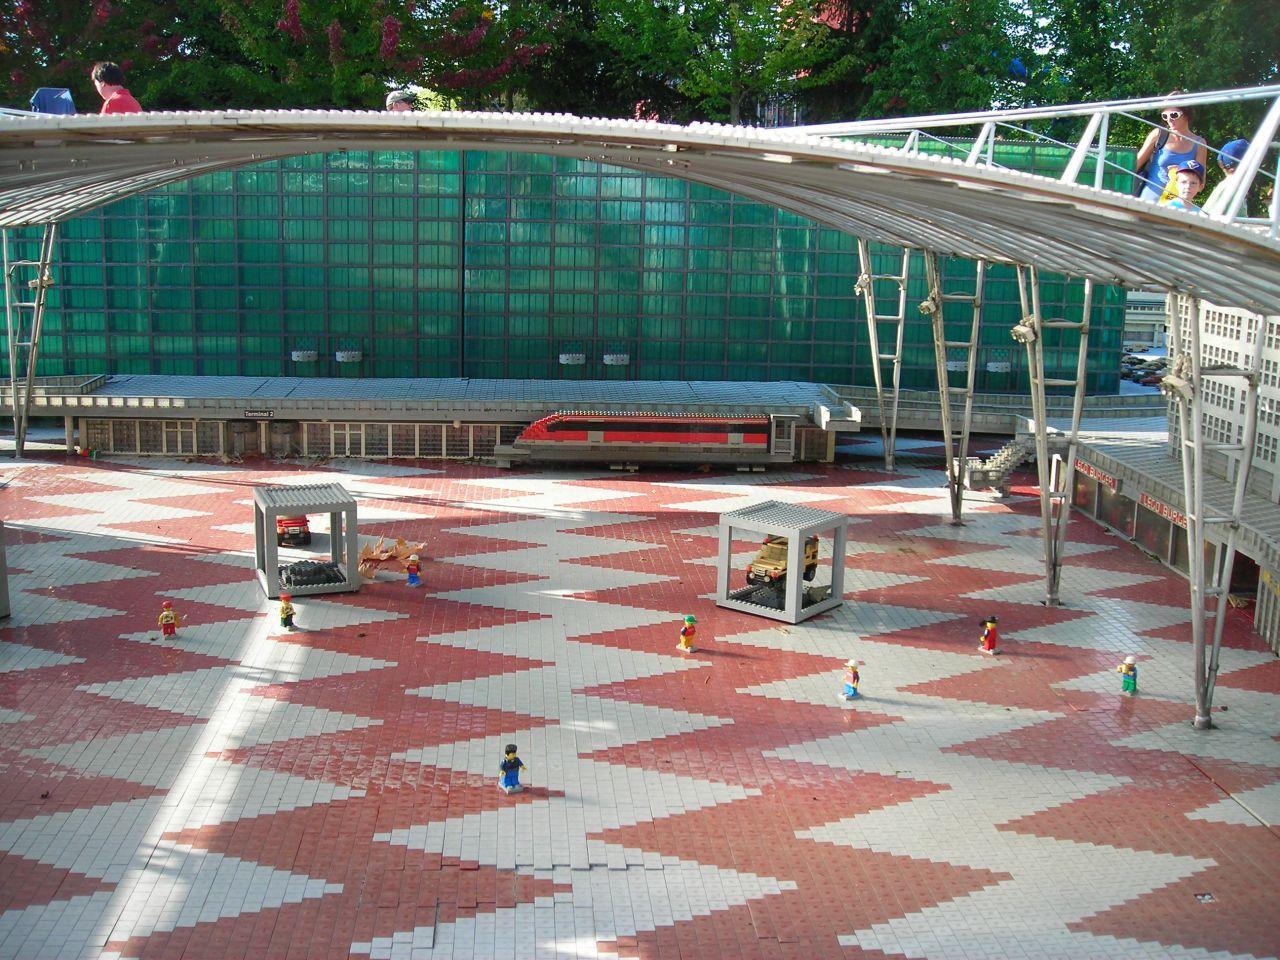 Legoland münchen transrapid